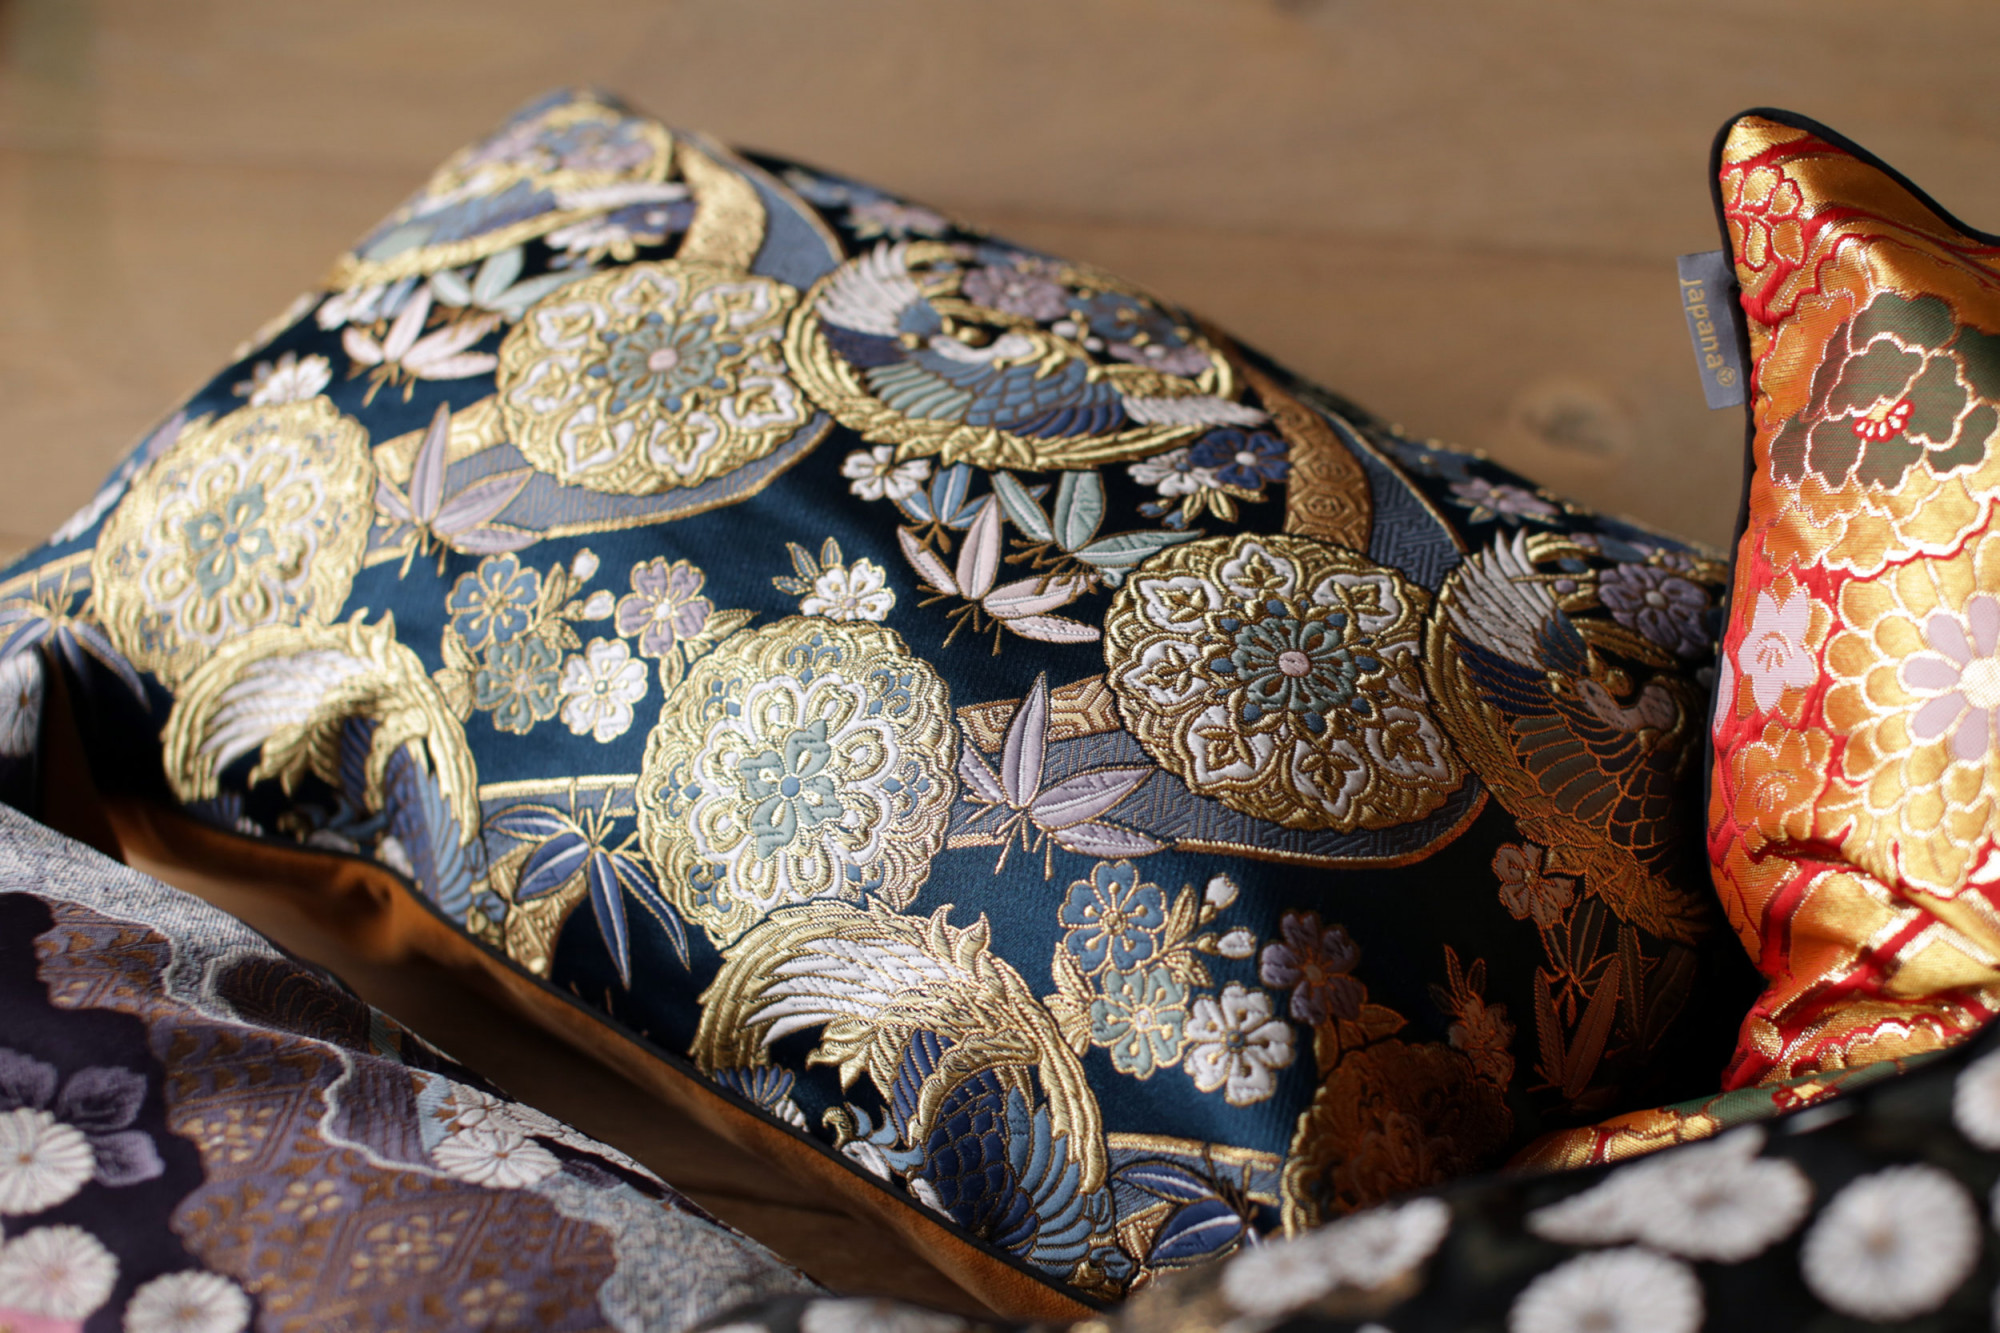 3 Japanese Kimono Silk Cushion Pillow Case luxury Limited Edition 2